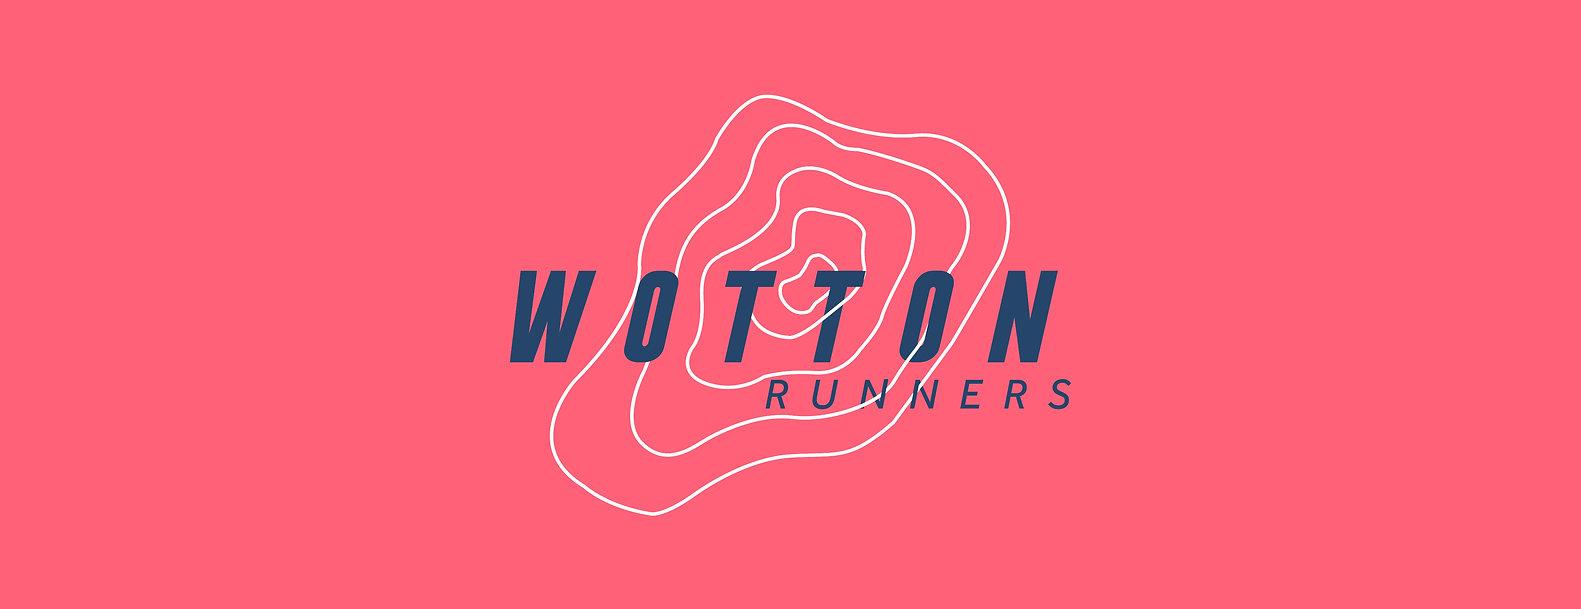 Wotton Runners Logo.jpg